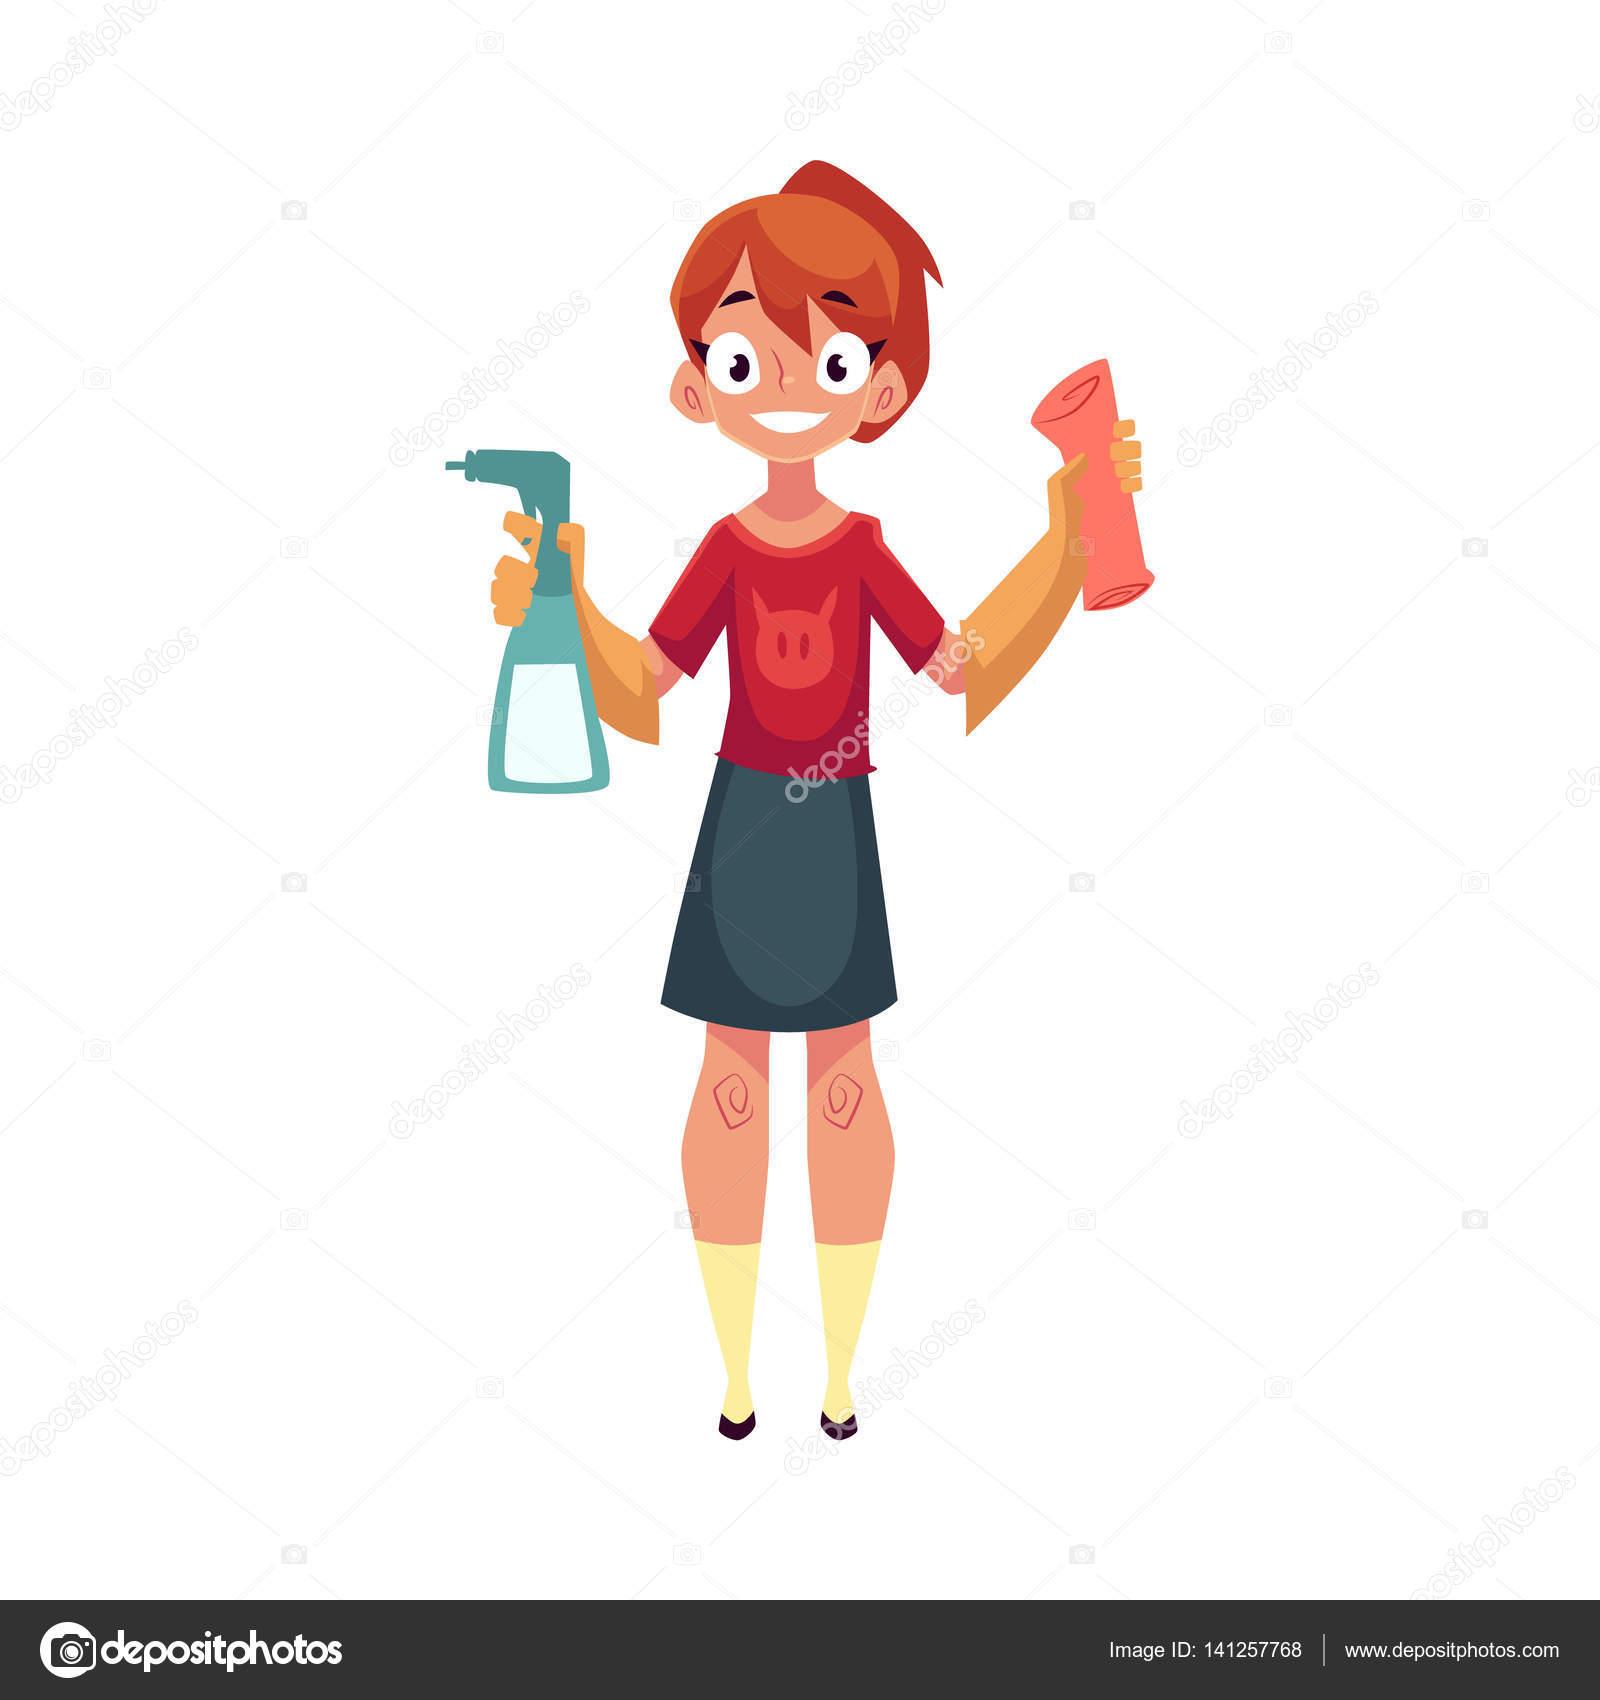 Como limpiar una casa a fondo latest bao rstico - Como limpiar la casa a fondo ...